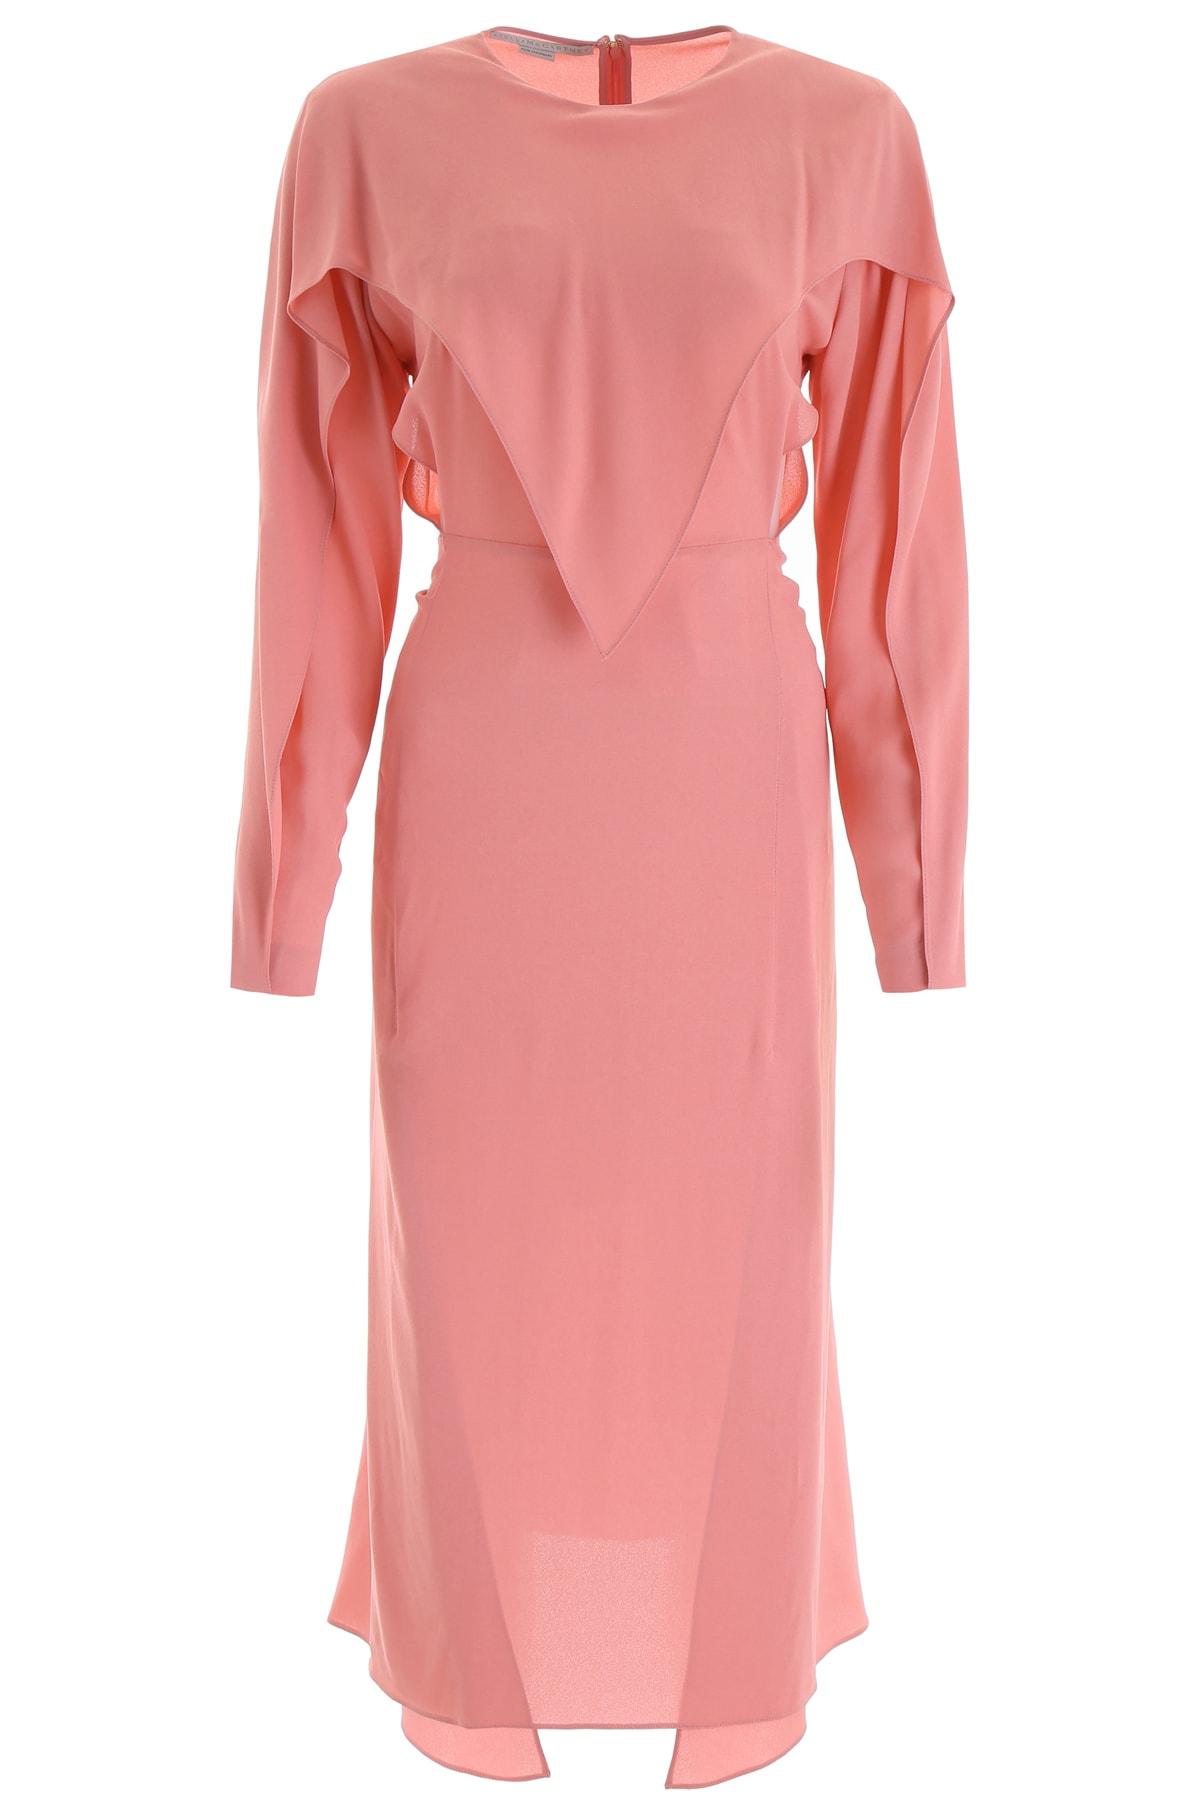 Buy Stella McCartney Crepe Dress online, shop Stella McCartney with free shipping